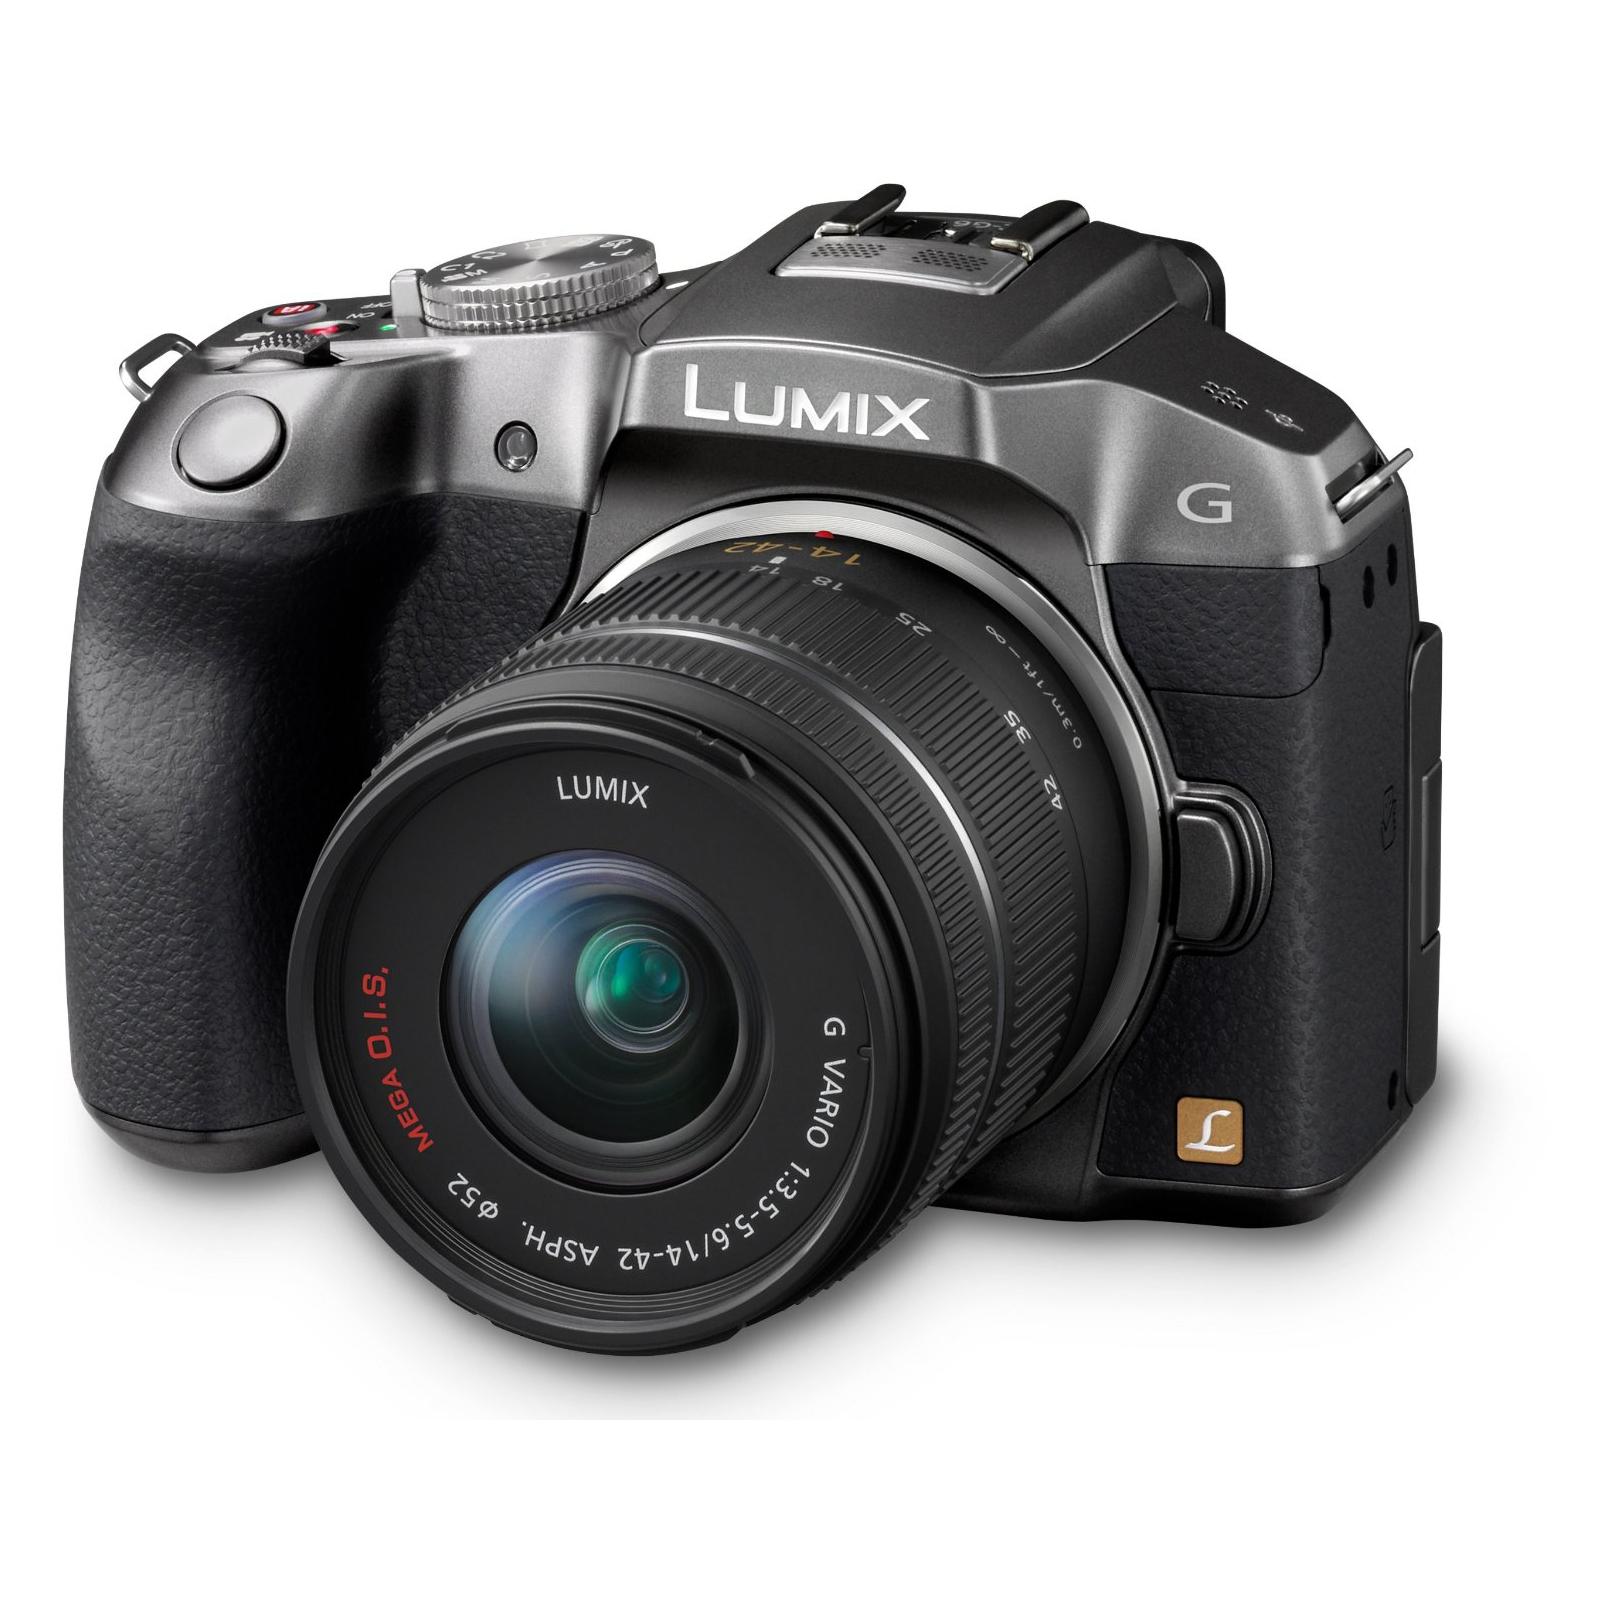 Цифровой фотоаппарат PANASONIC DMC-G6 silver 14-42 kit (DMC-G6KEE-S)